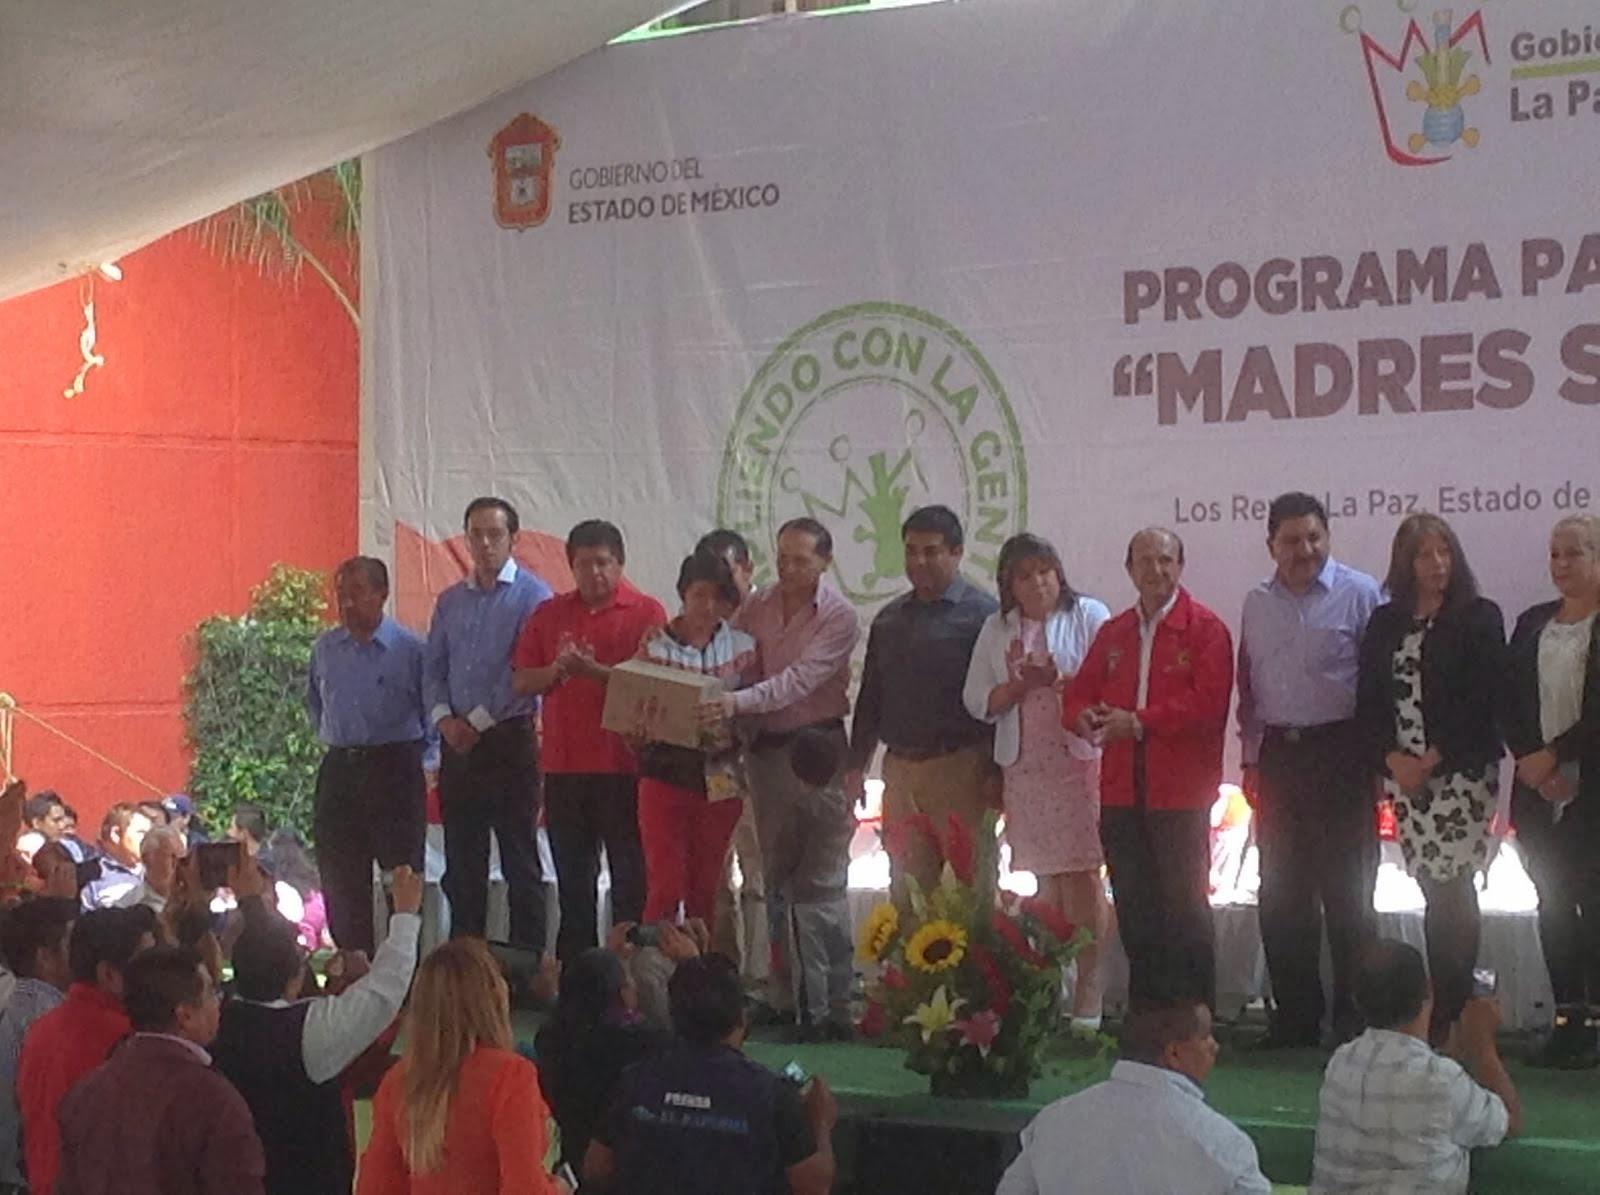 ENTREGA DE PROGRAMAS SOCIALES